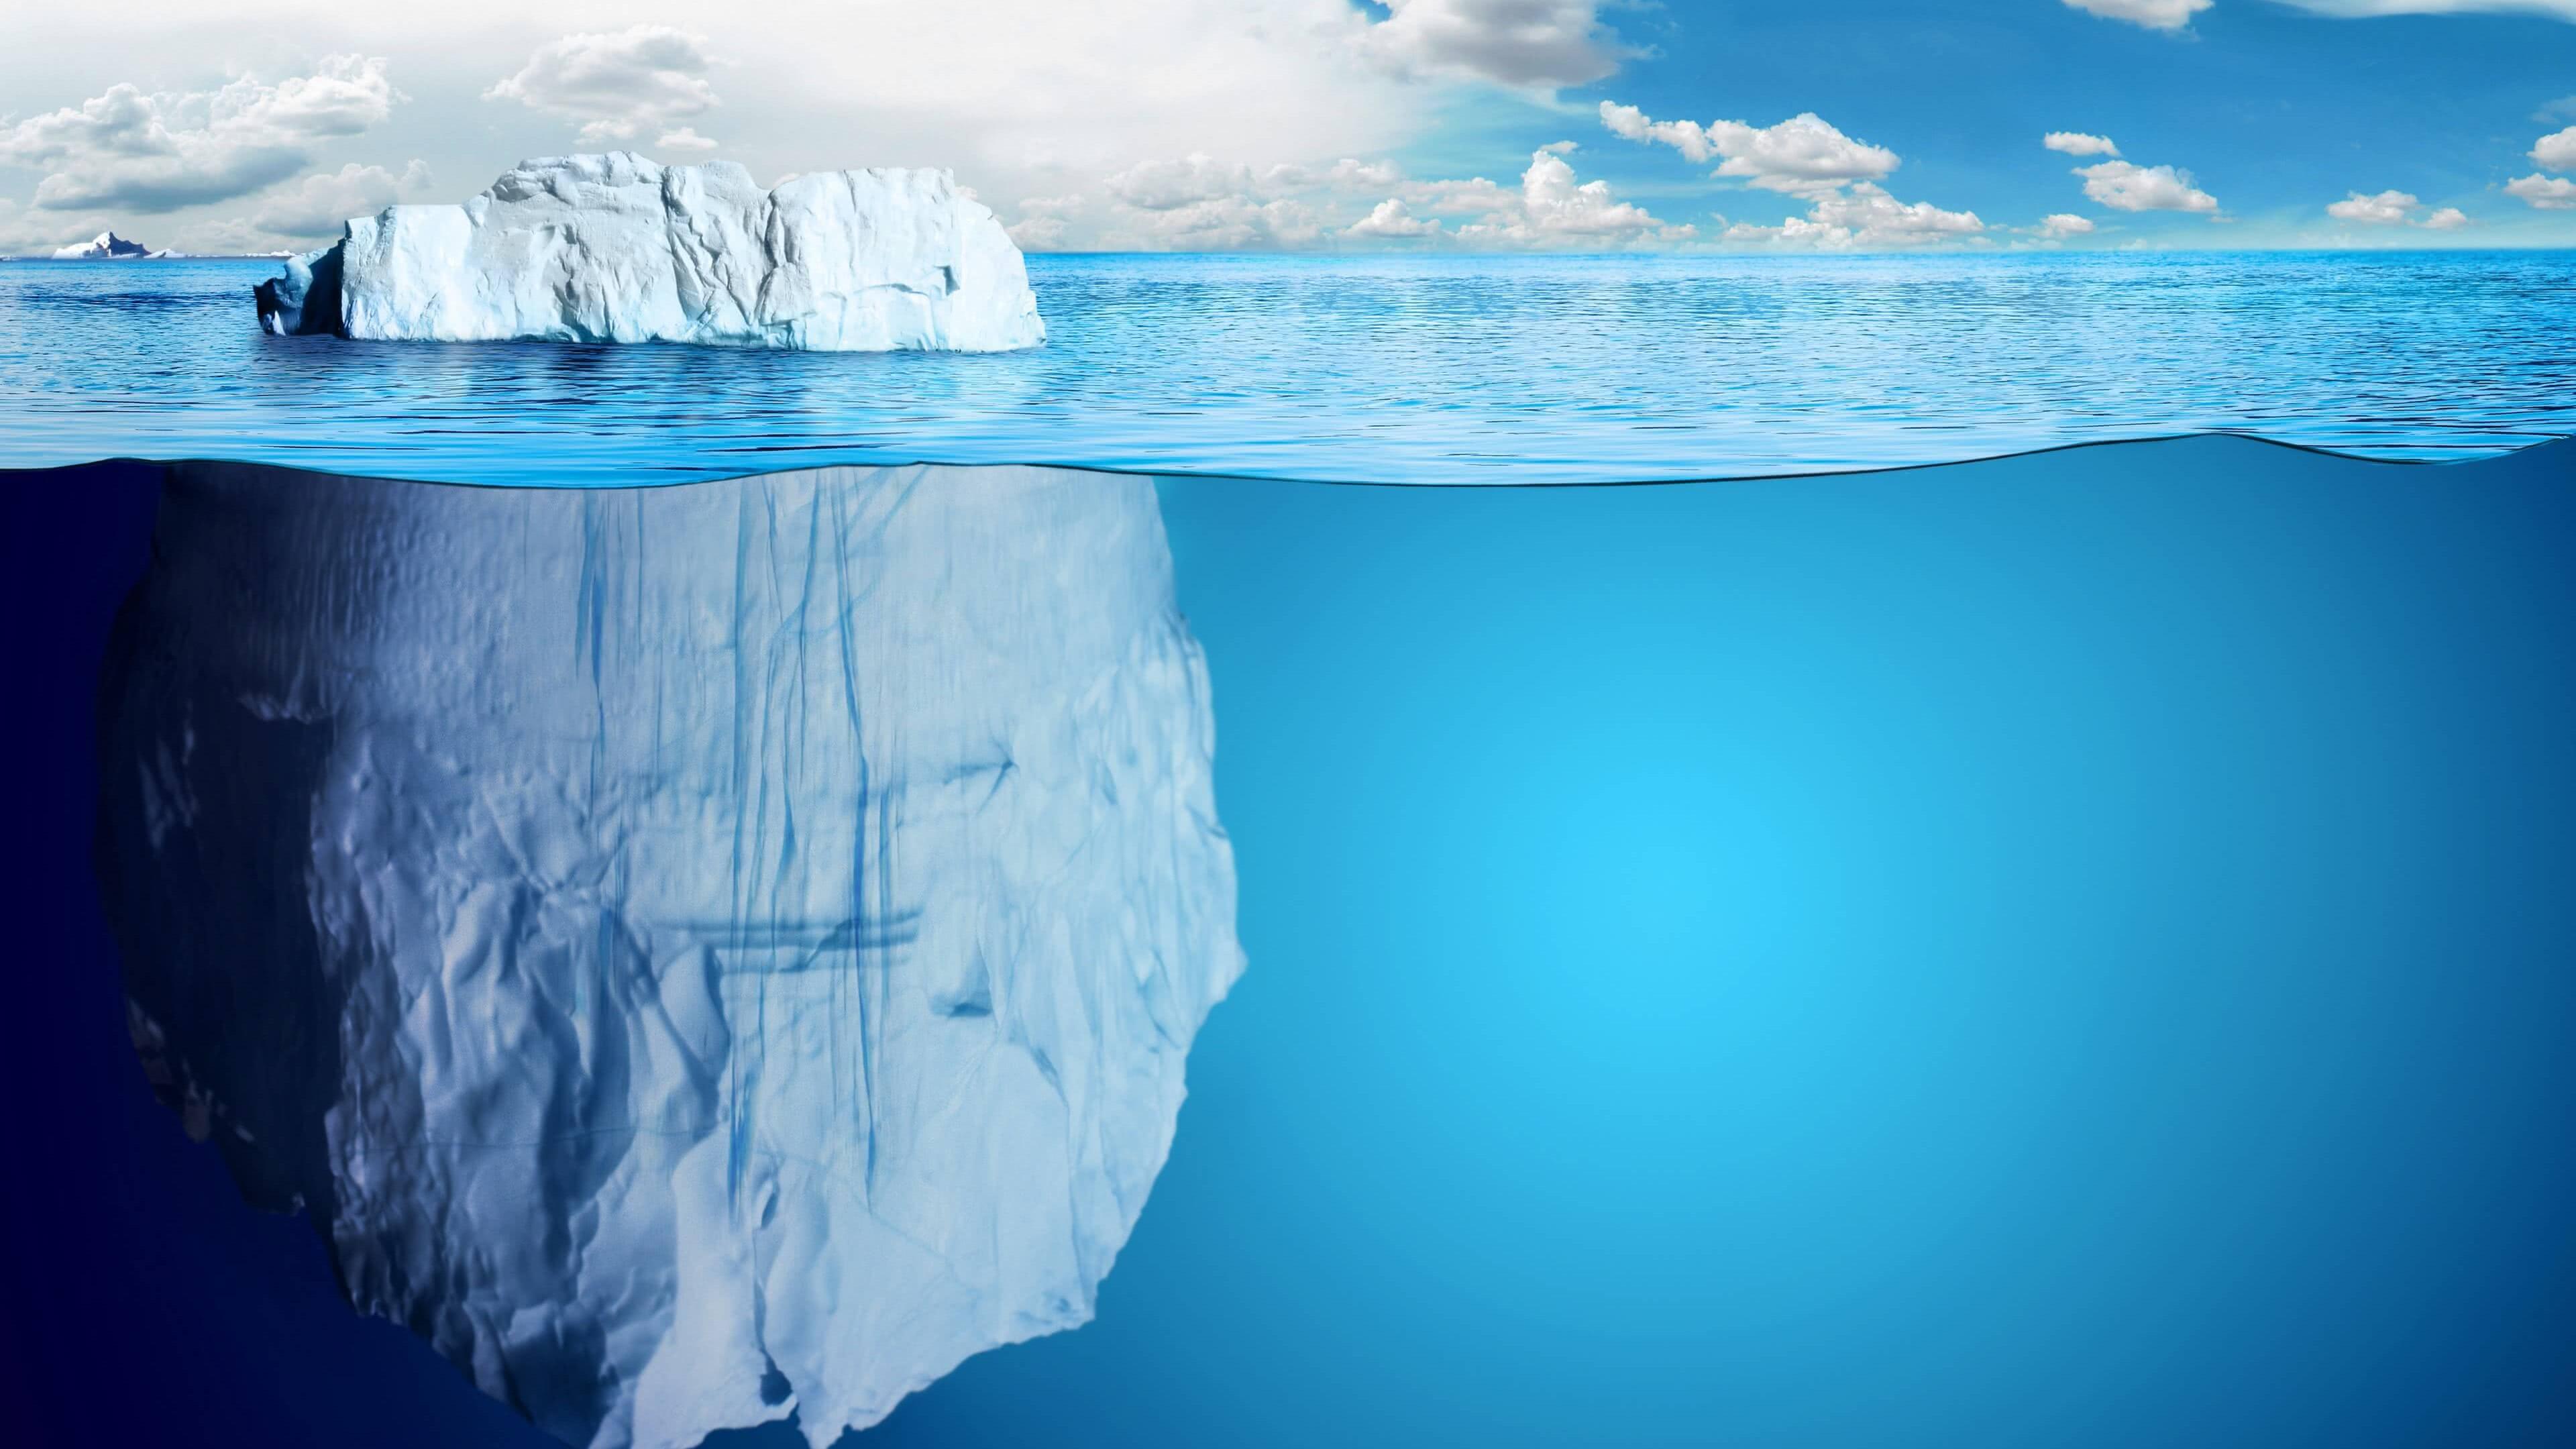 Iceberg Underwater Uhd 4k Wallpaper Pixelz